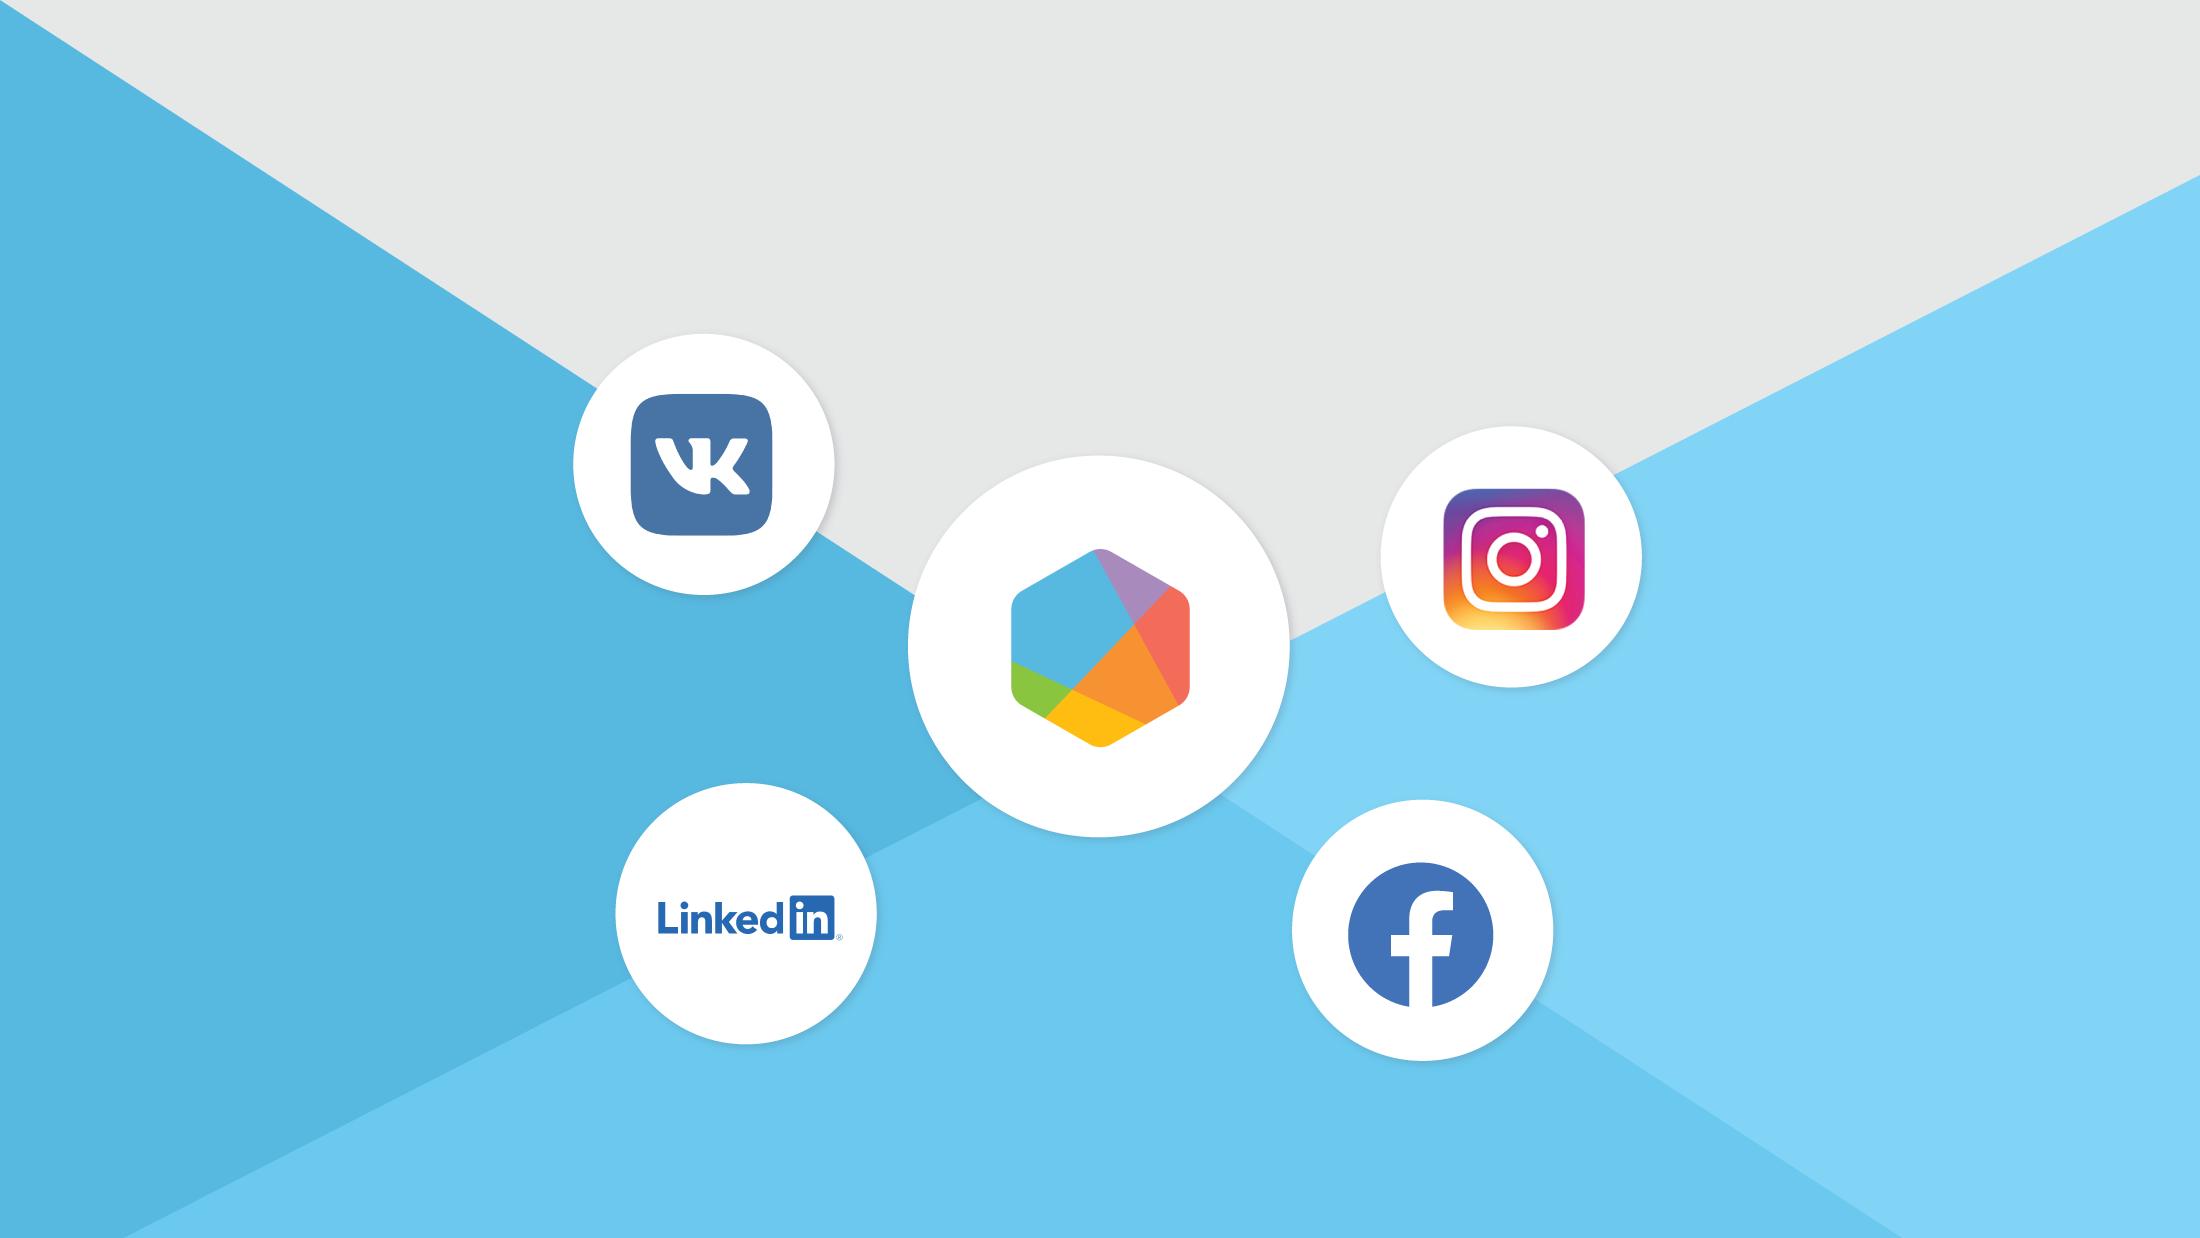 New Data Updates: Vkontakte, Facebook, Instagram, and LinkedIn